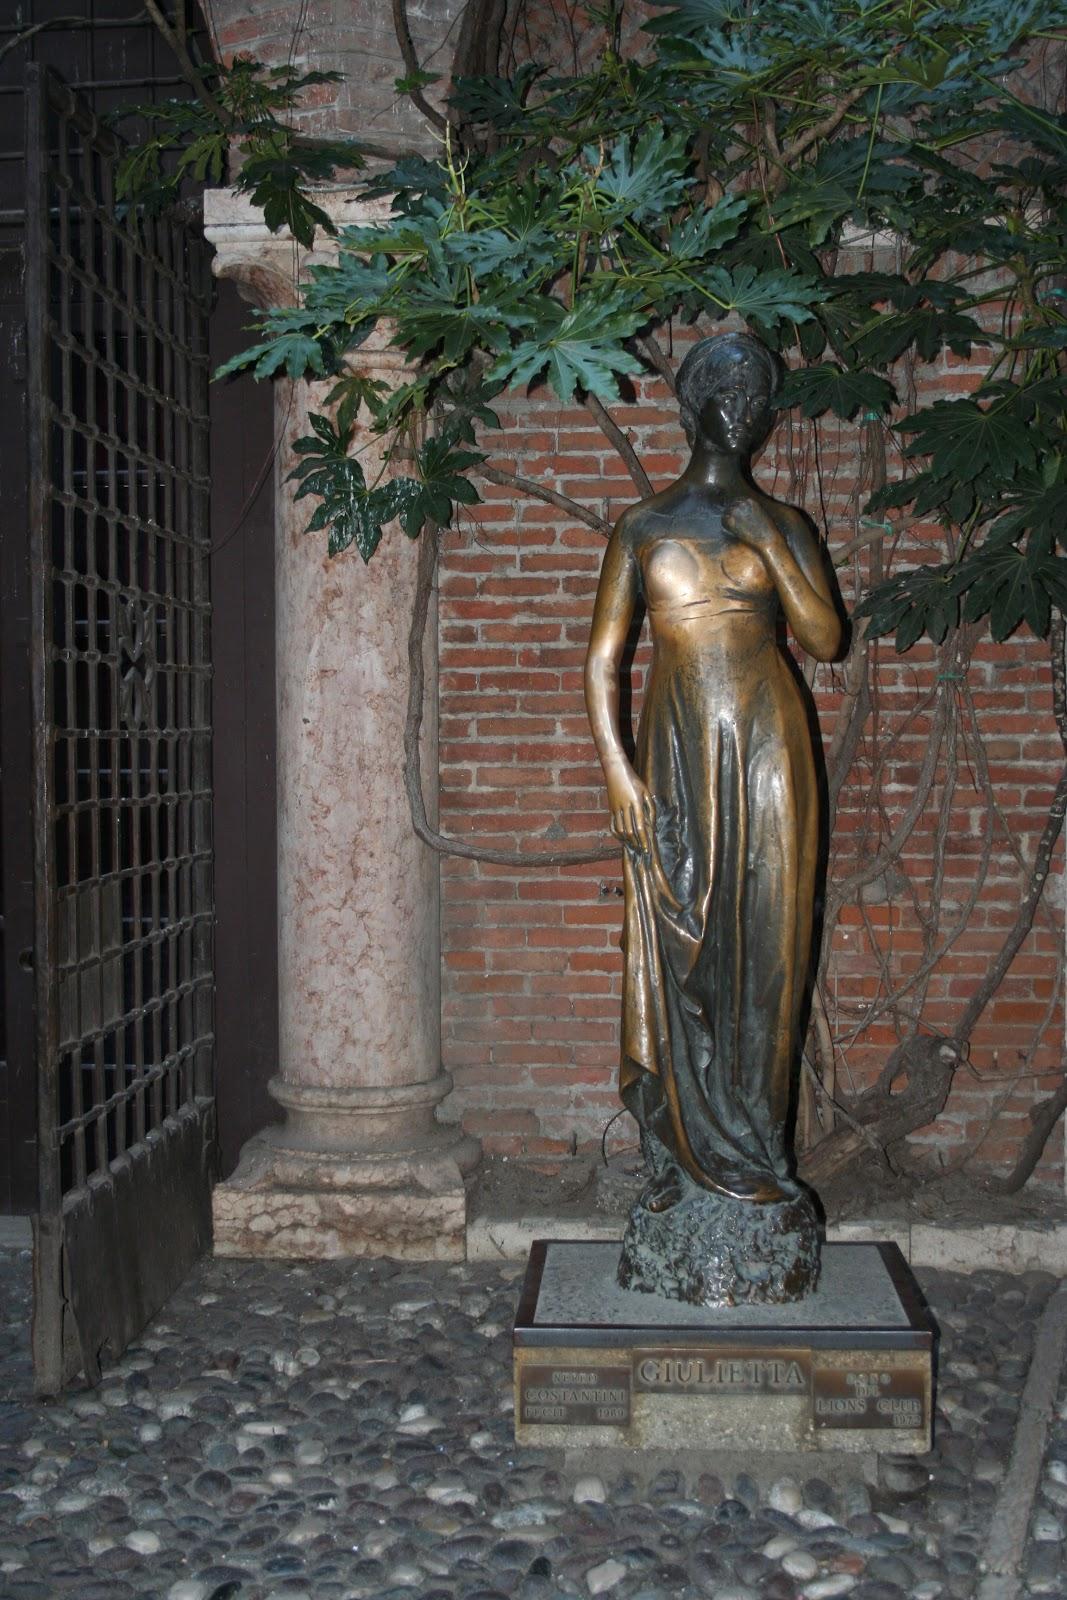 Statue Julietta - Ferrara - Italy